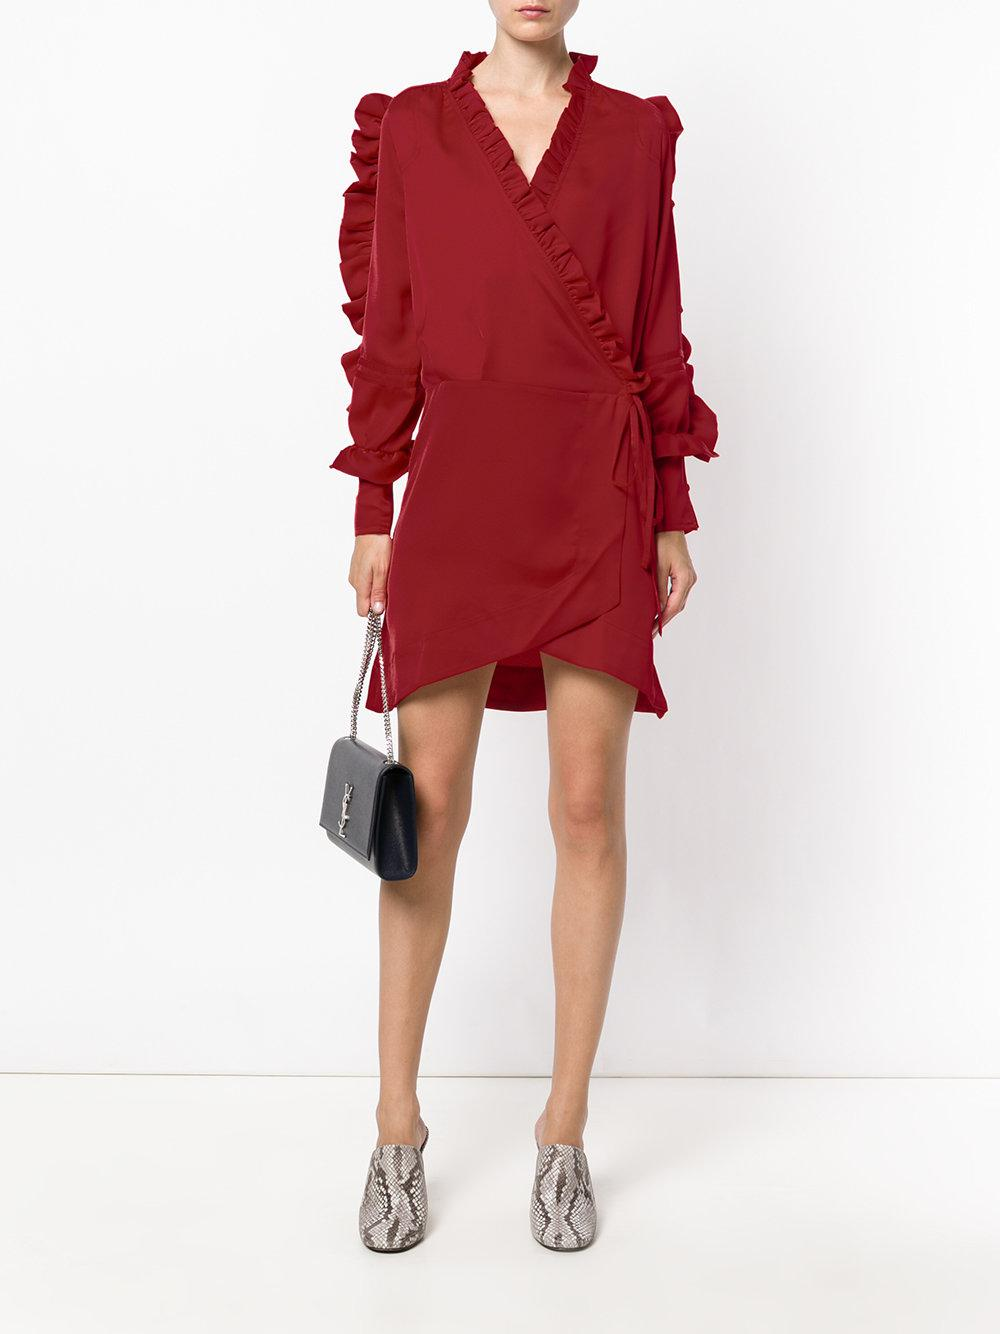 ruffle detail short dress - Red iiL7 rl8uP